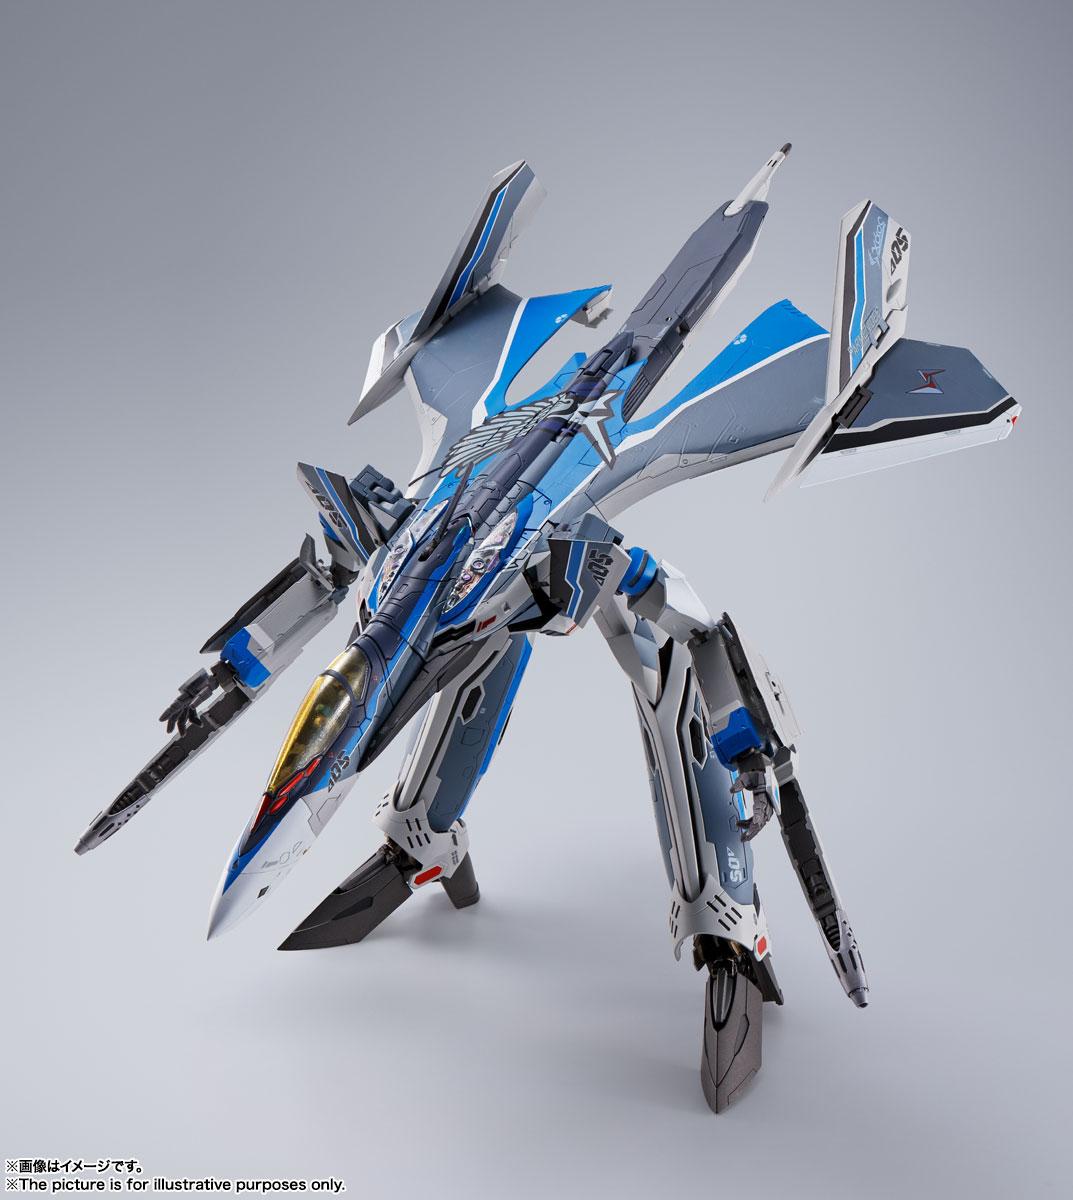 DX超合金『初回限定版 VF-31AX カイロスプラス(ハヤテ・インメルマン機)』マクロスΔ 可変可動フィギュア-009